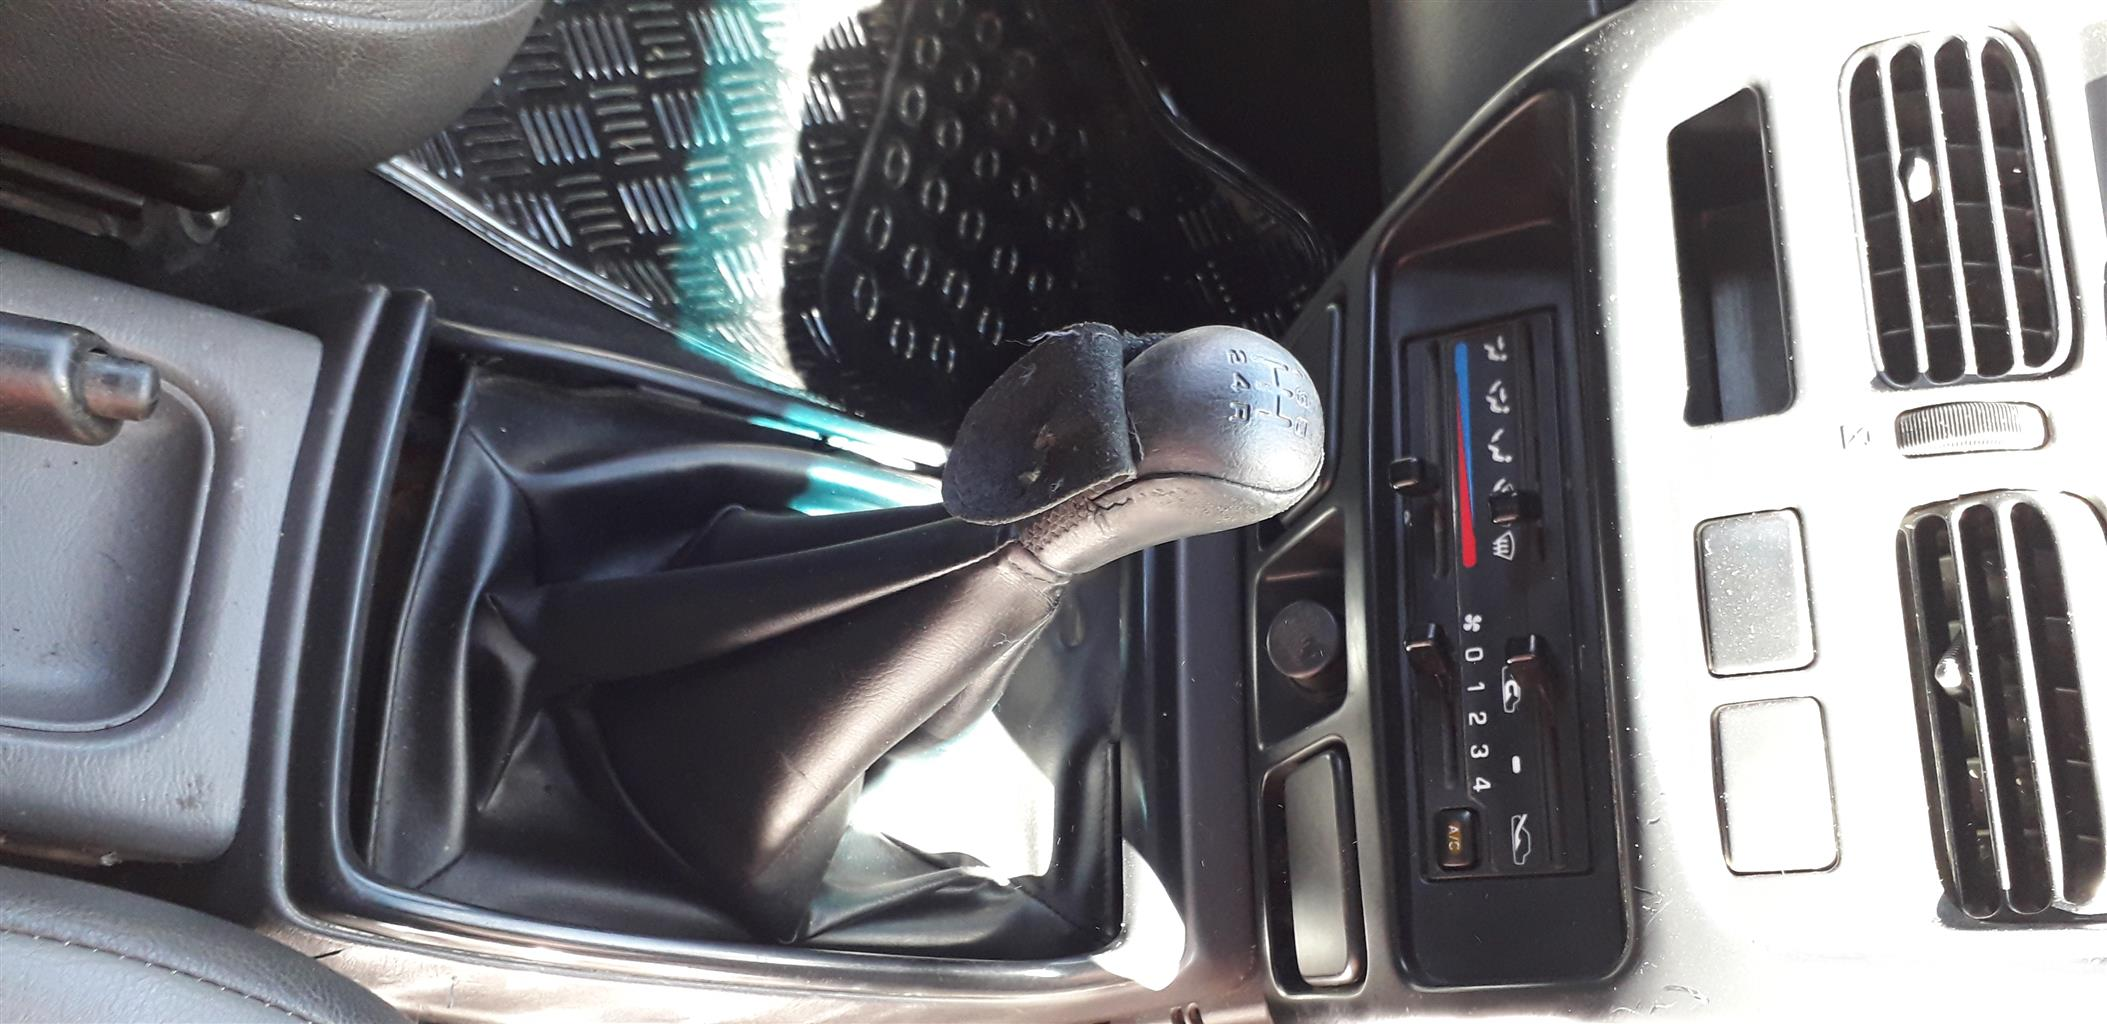 2014 Nissan NP300 Hardbody 2.4 double cab 4x4